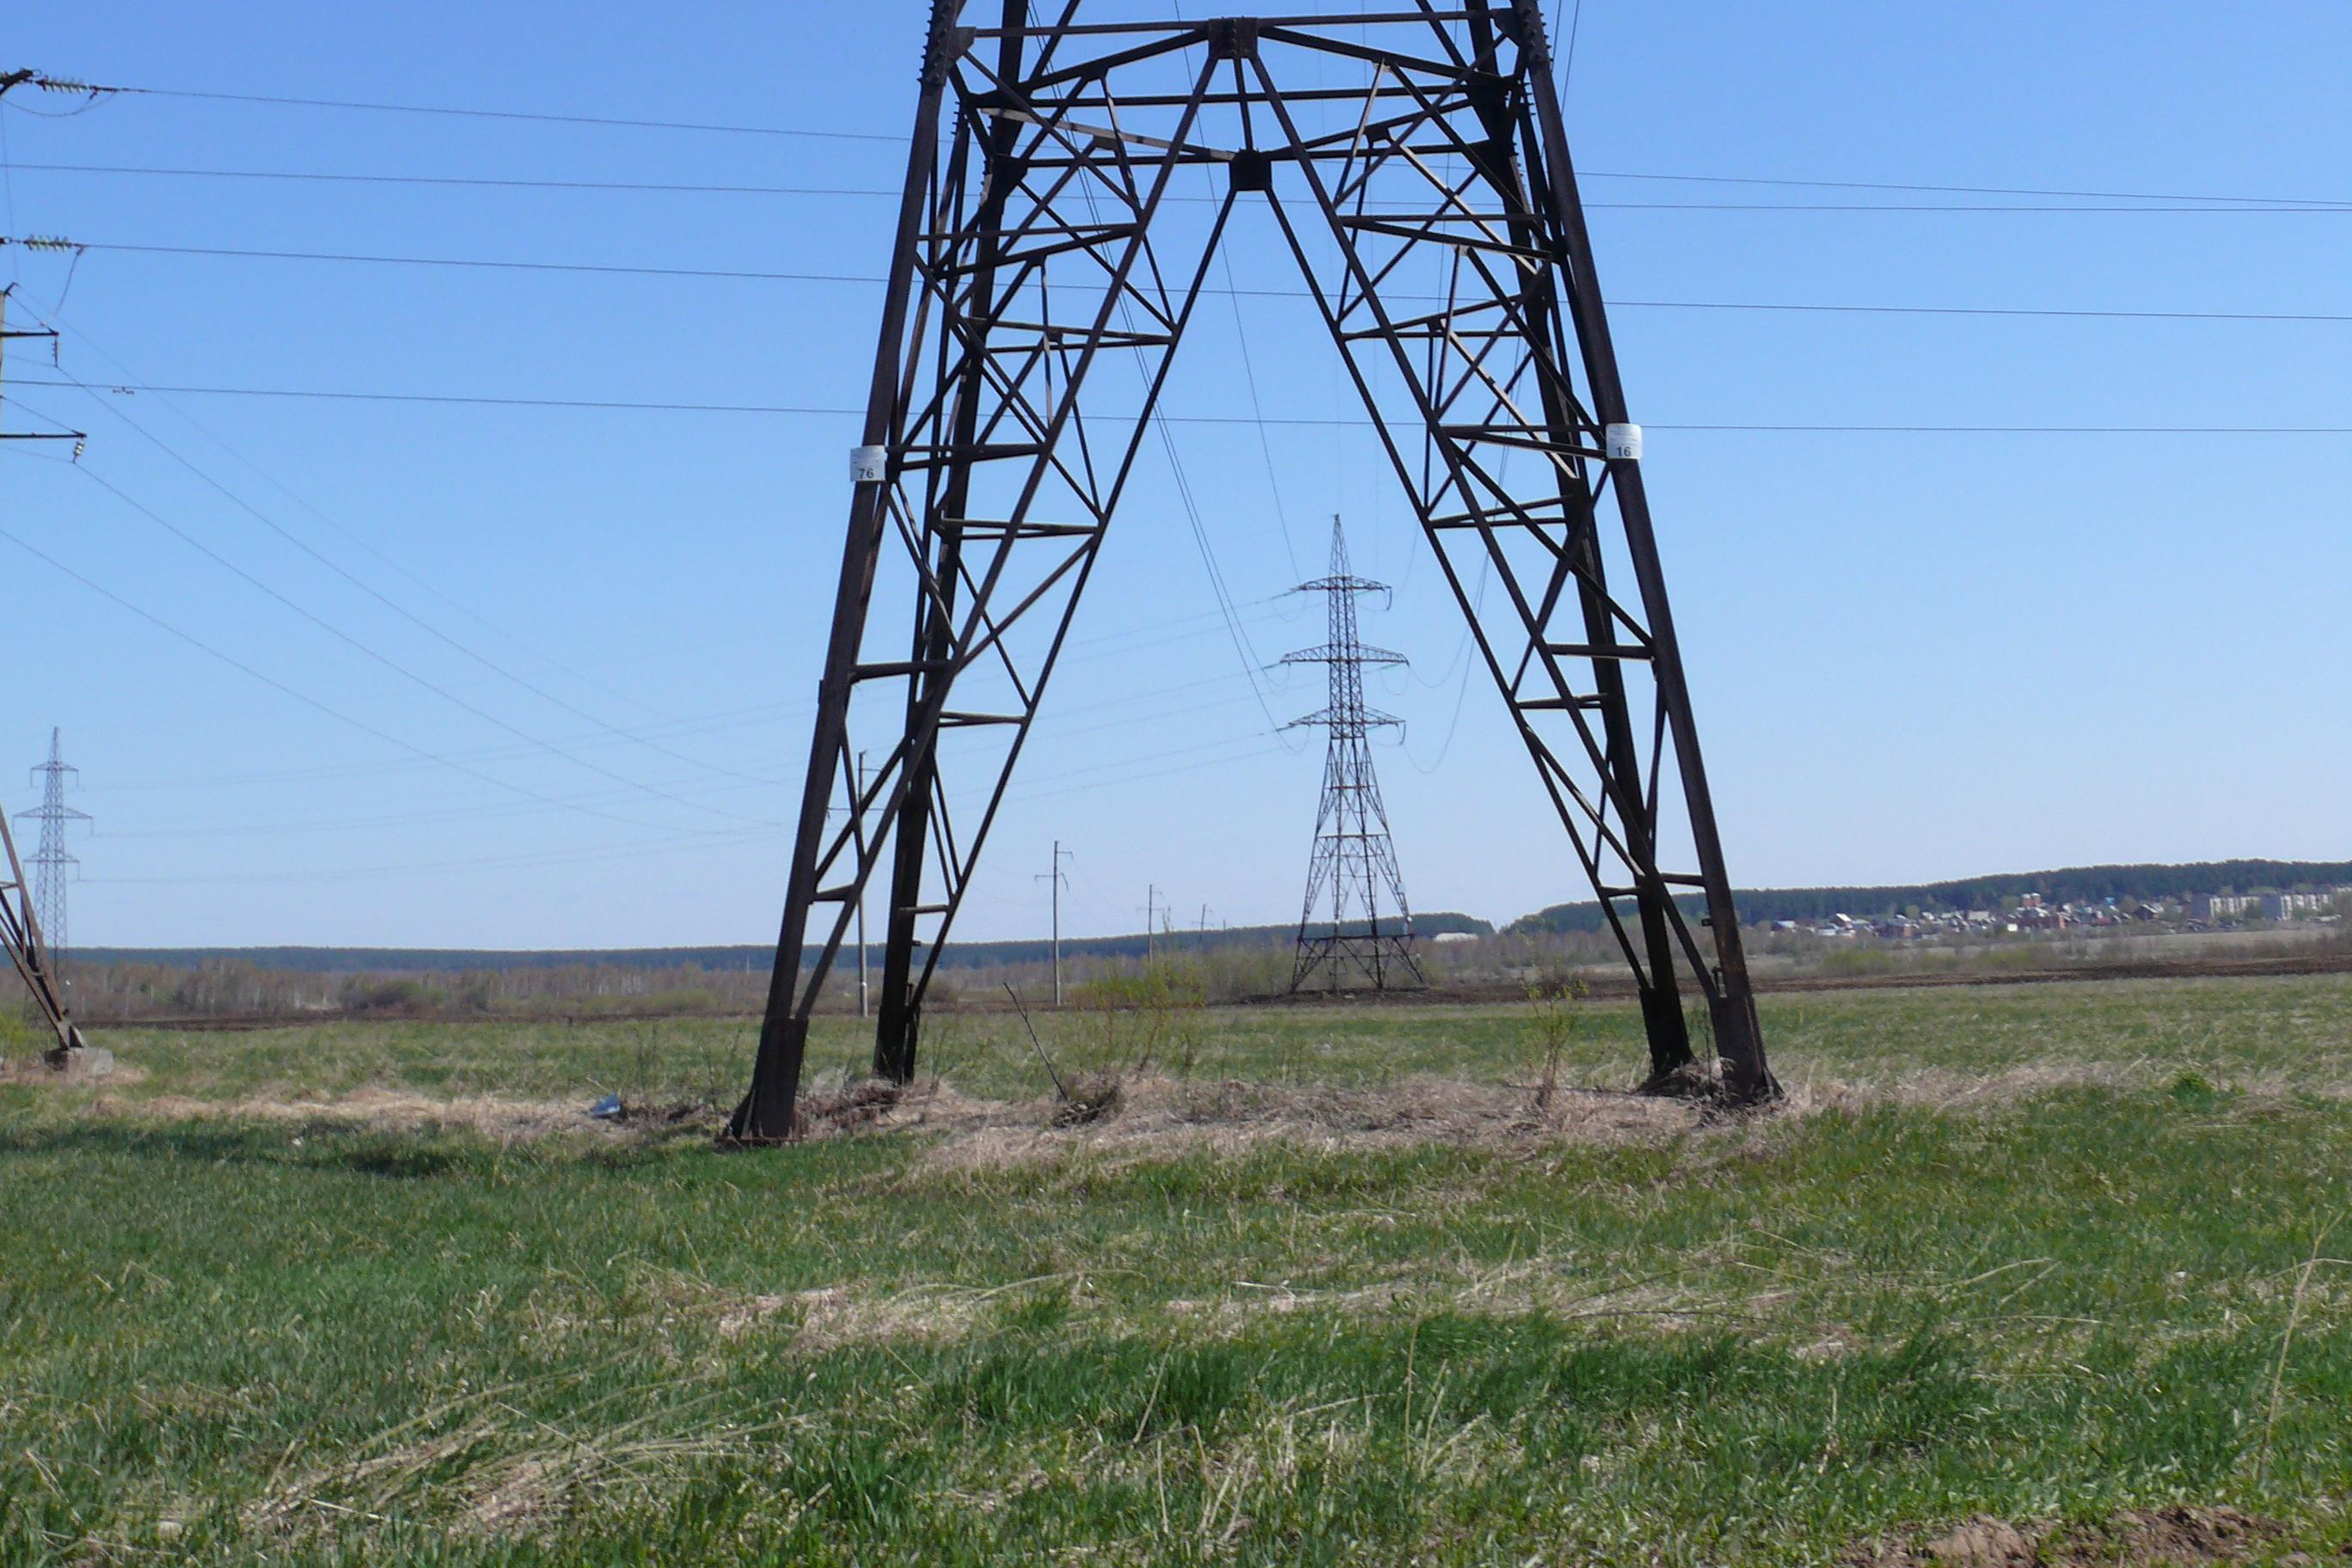 Правительство предложило россиянам абонентскую плату за электричество